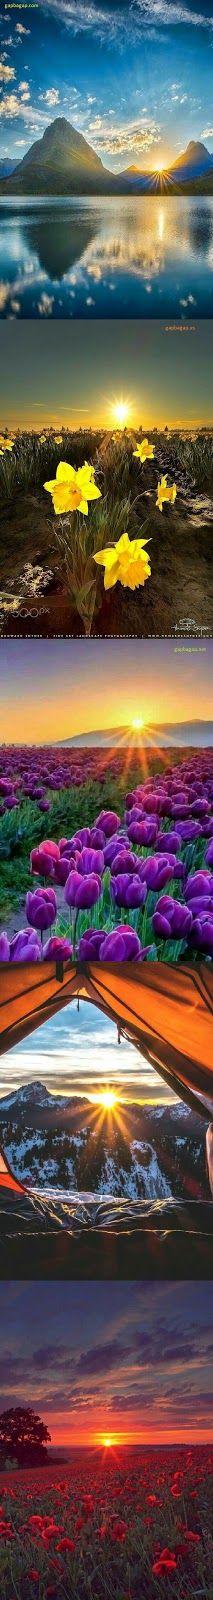 Top 5 Amazing Photography Of Sunrise and Sunset